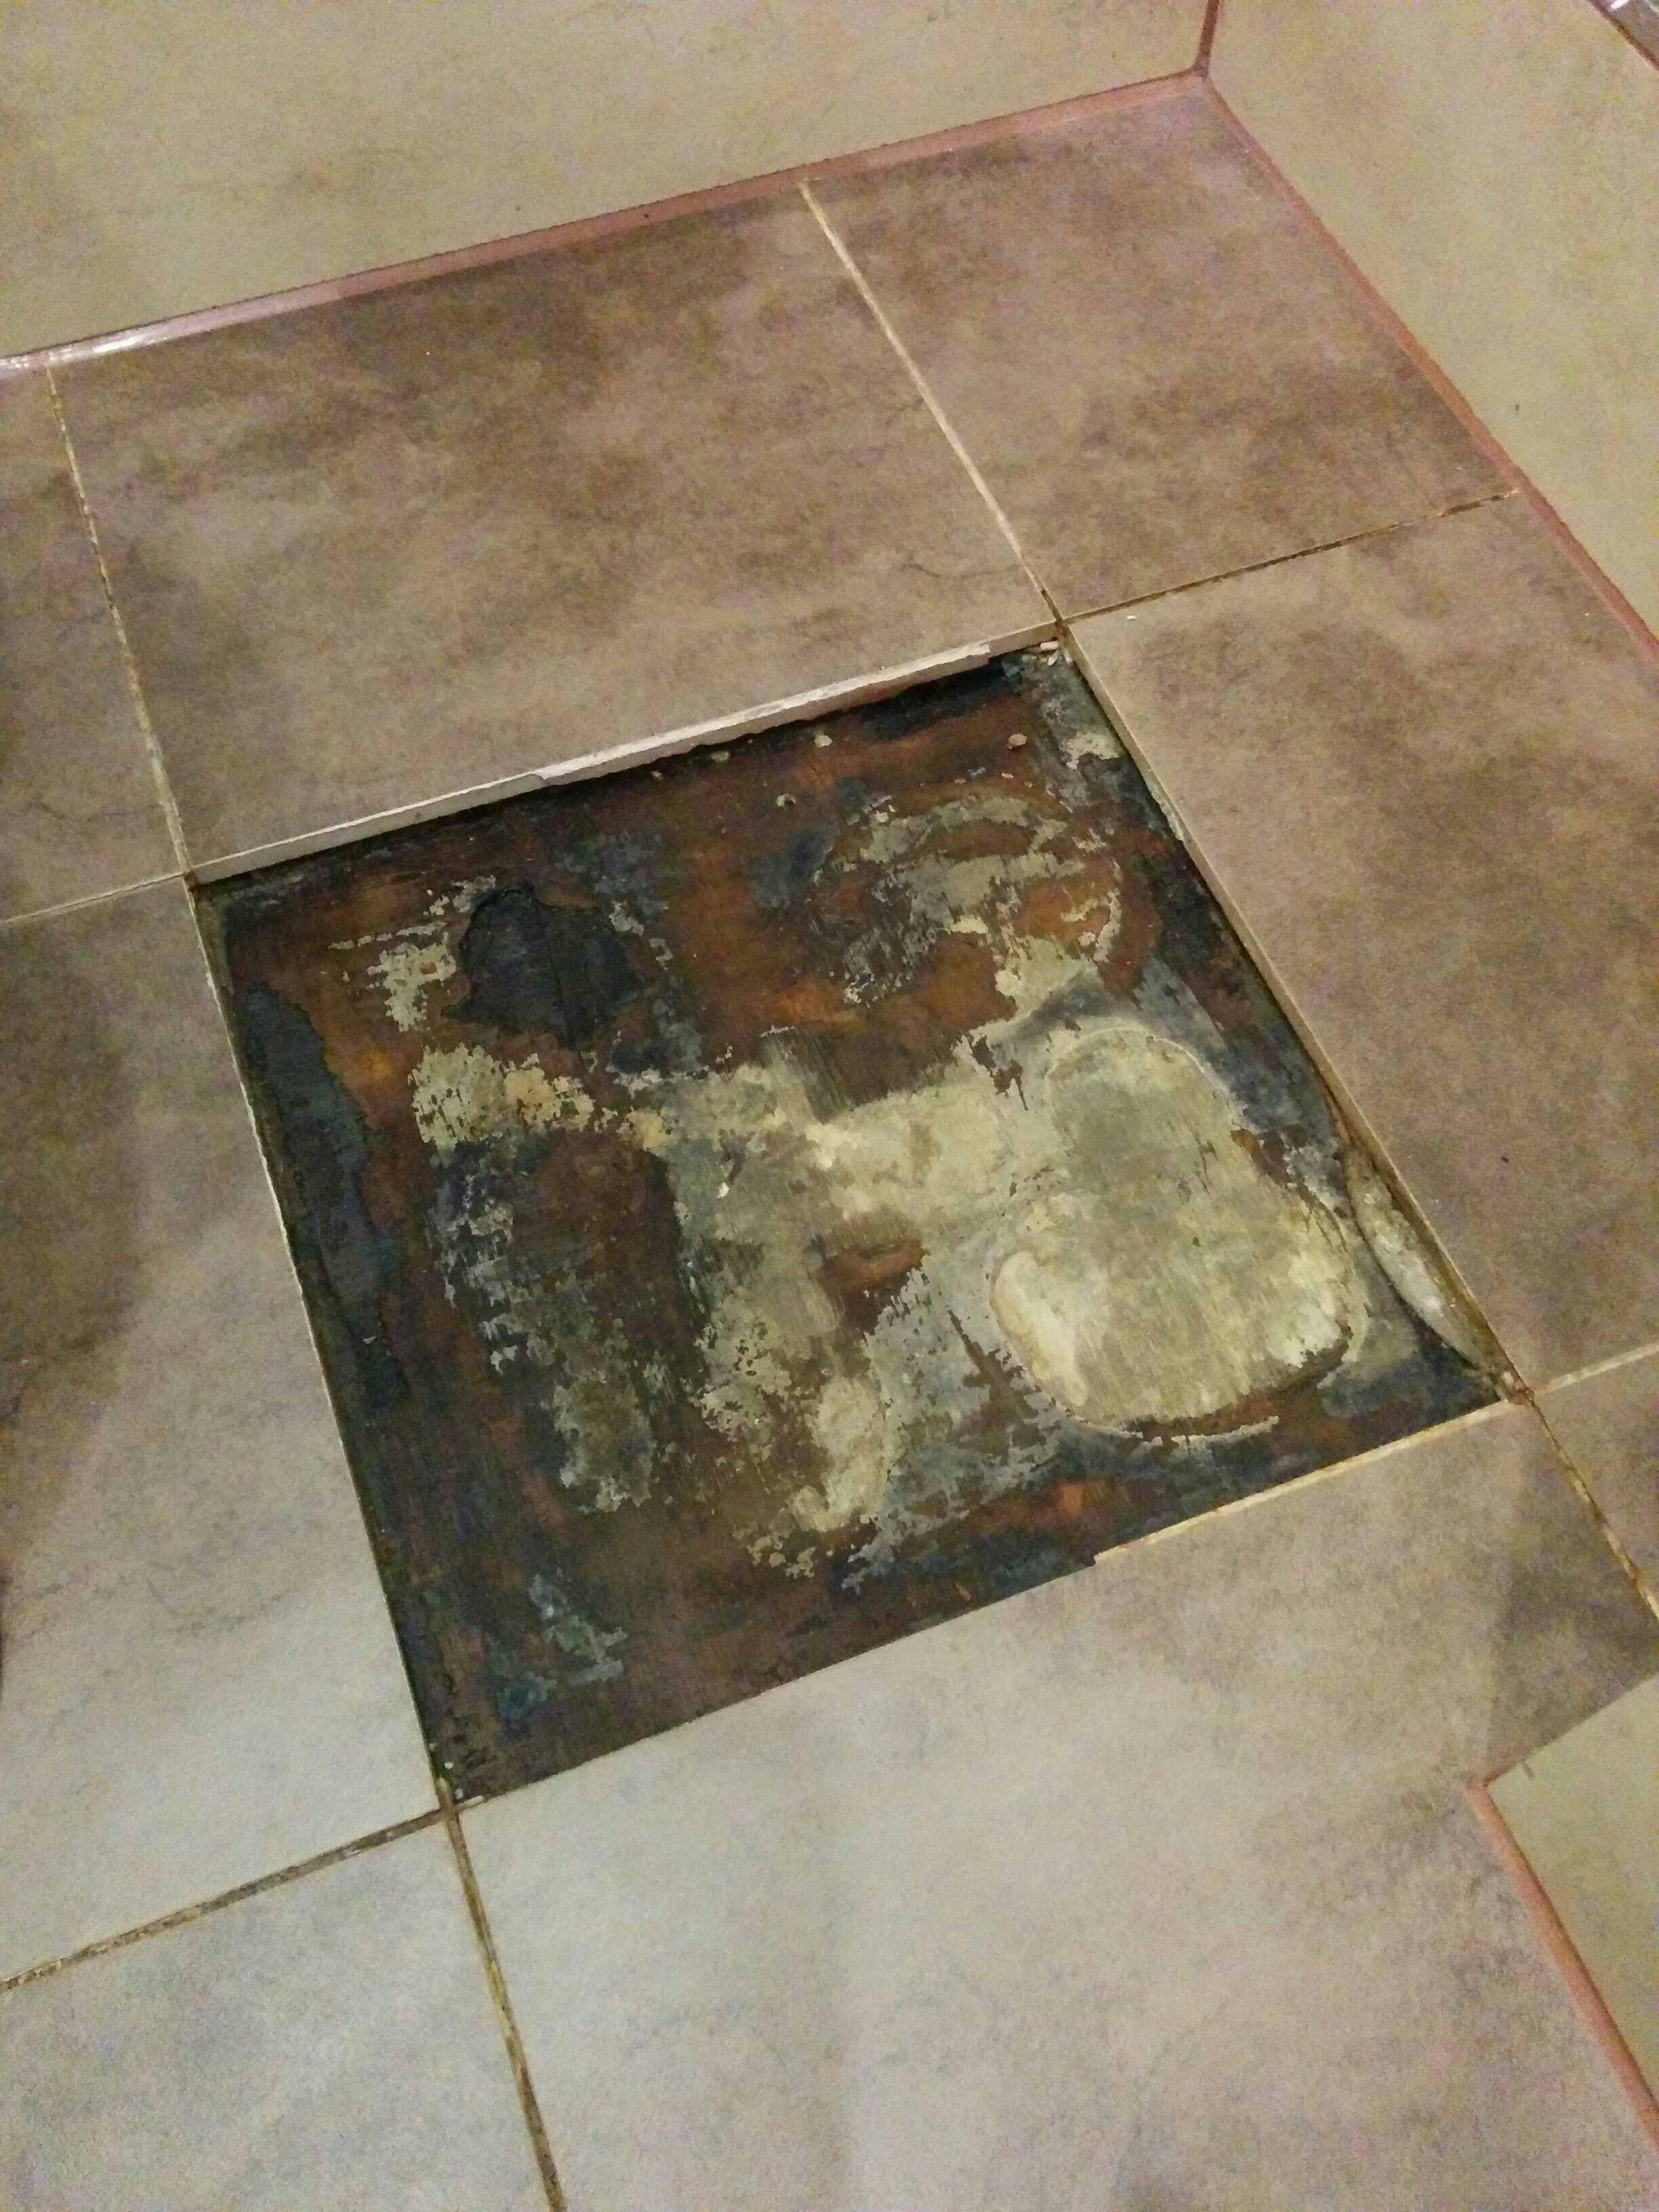 Water Leaking From Under Bathtub Mold In Bathroom Bathroom Floor Tiles Bathroom Wall Tile